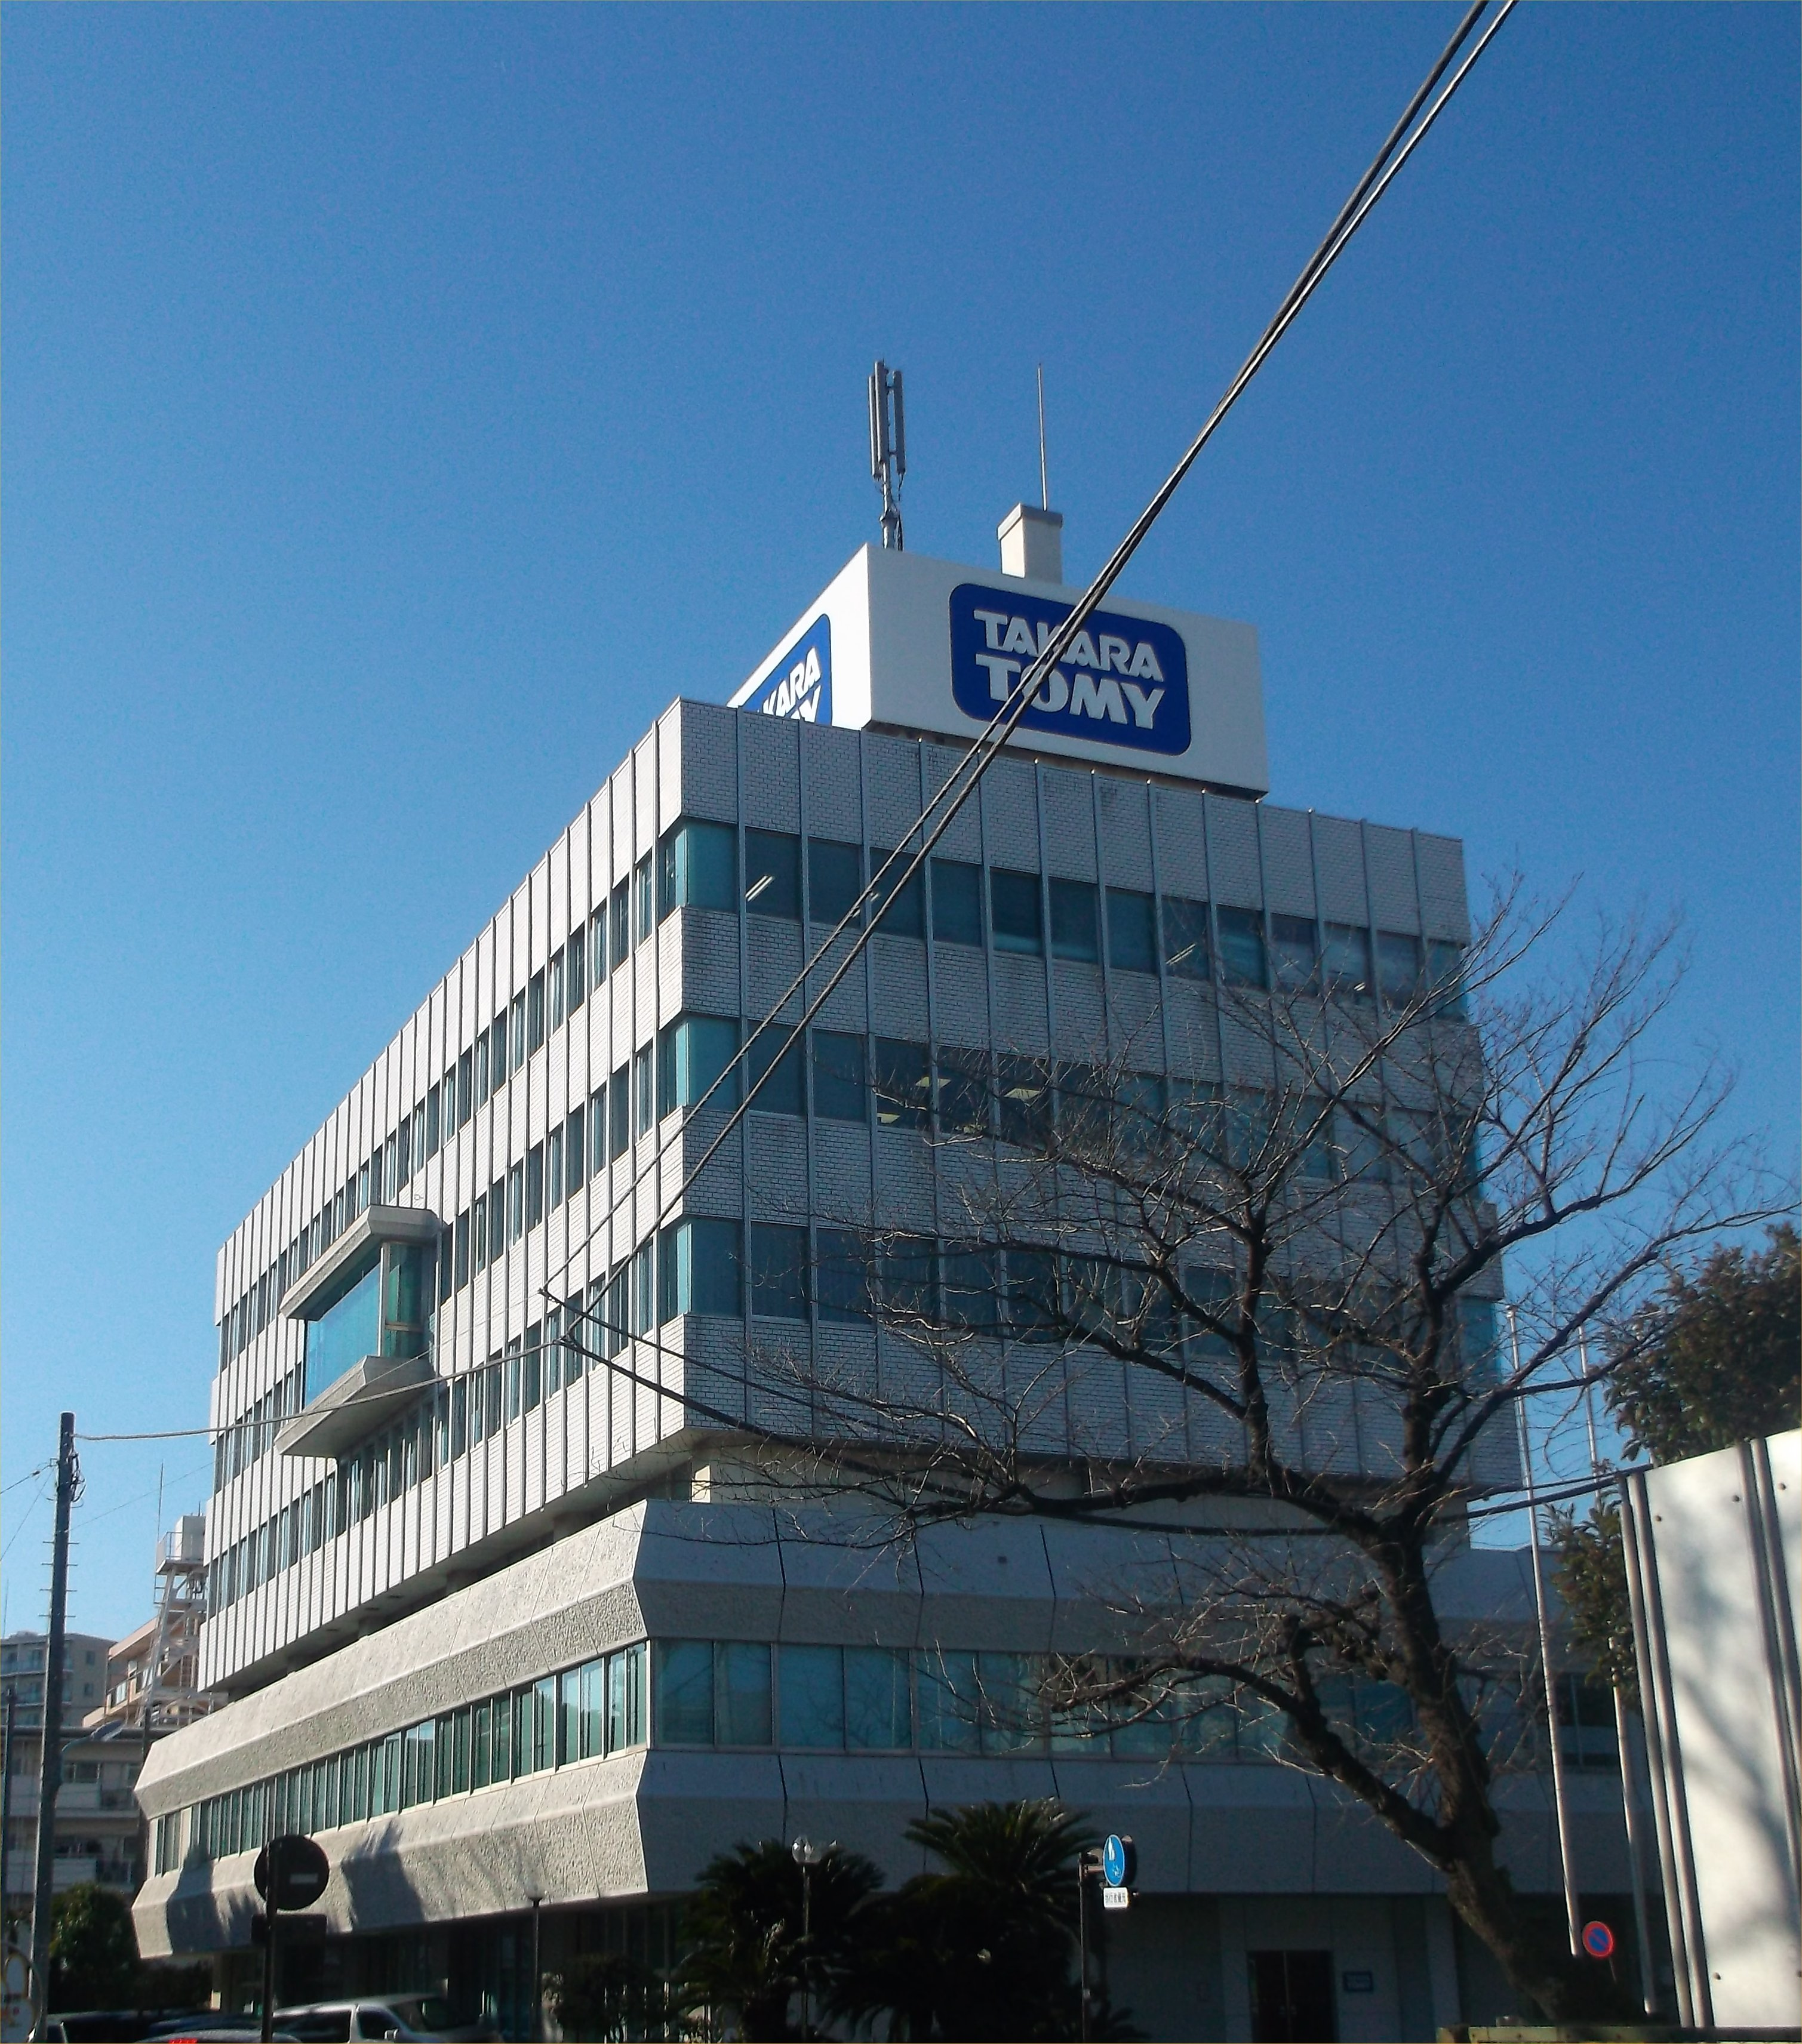 Takara - Wikipedia, la enciclopedia libre